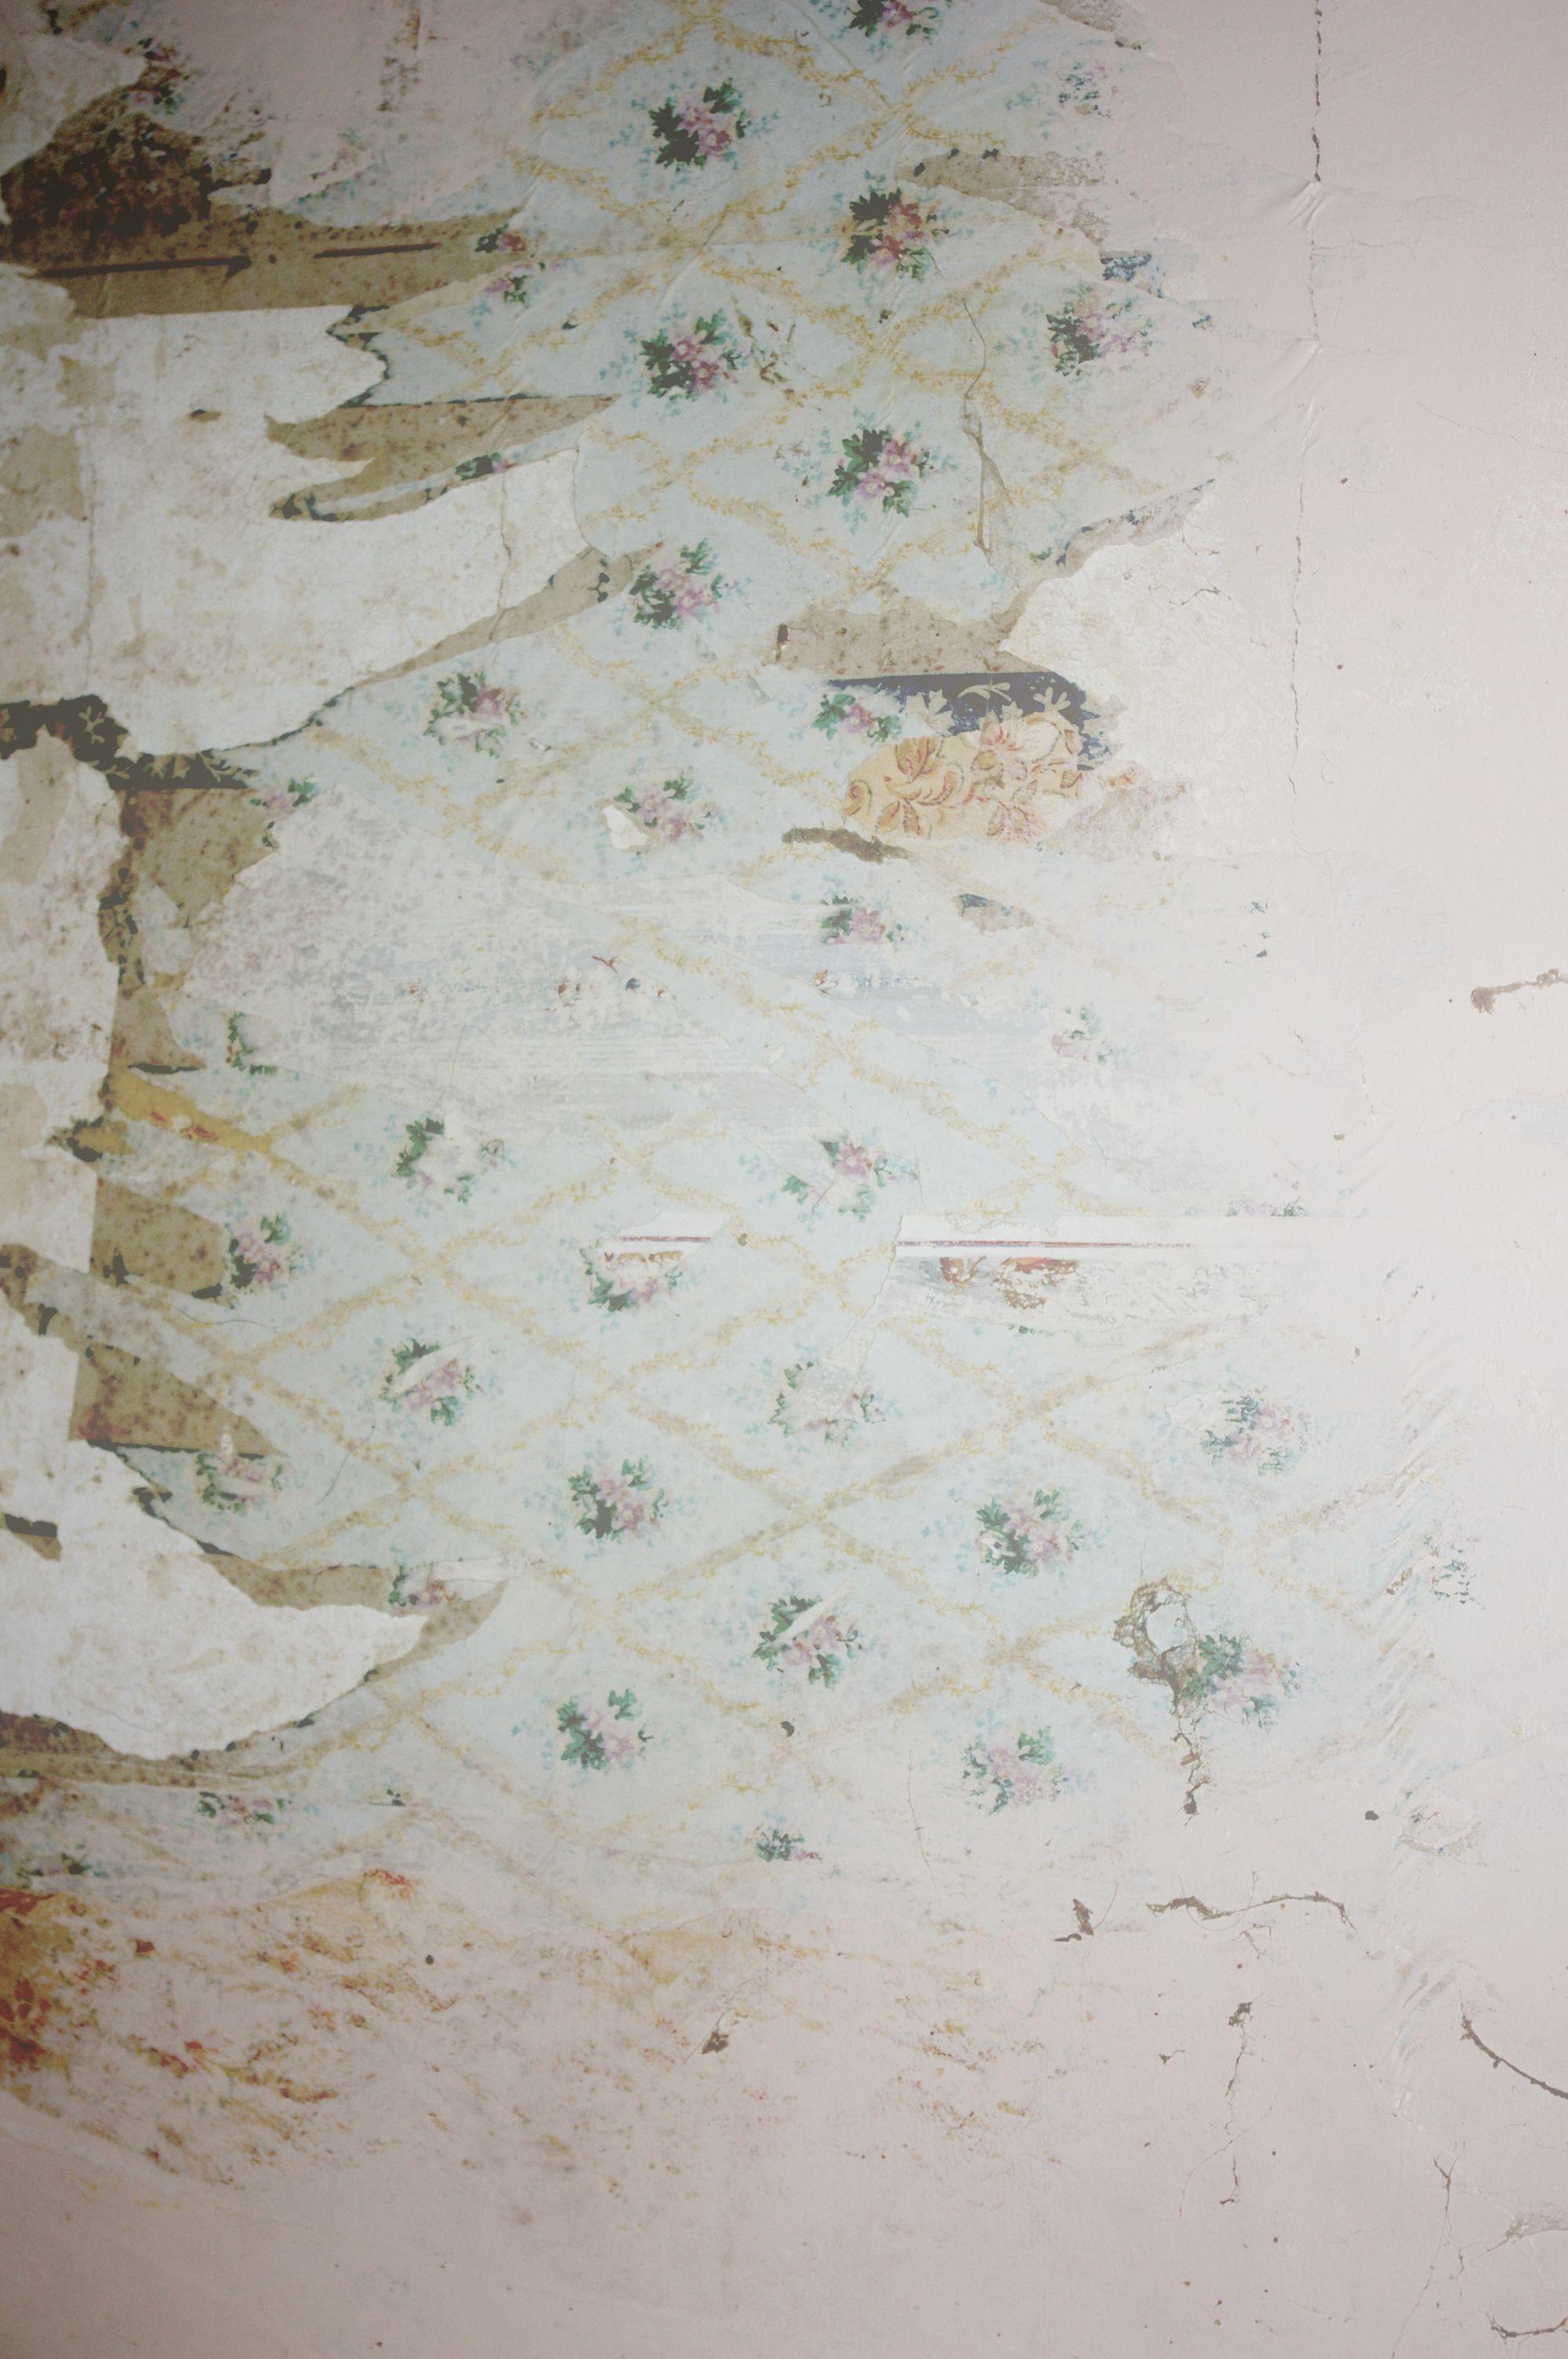 Peeling Wallpaper Painterly Texture Grunge Textures Wallpaper